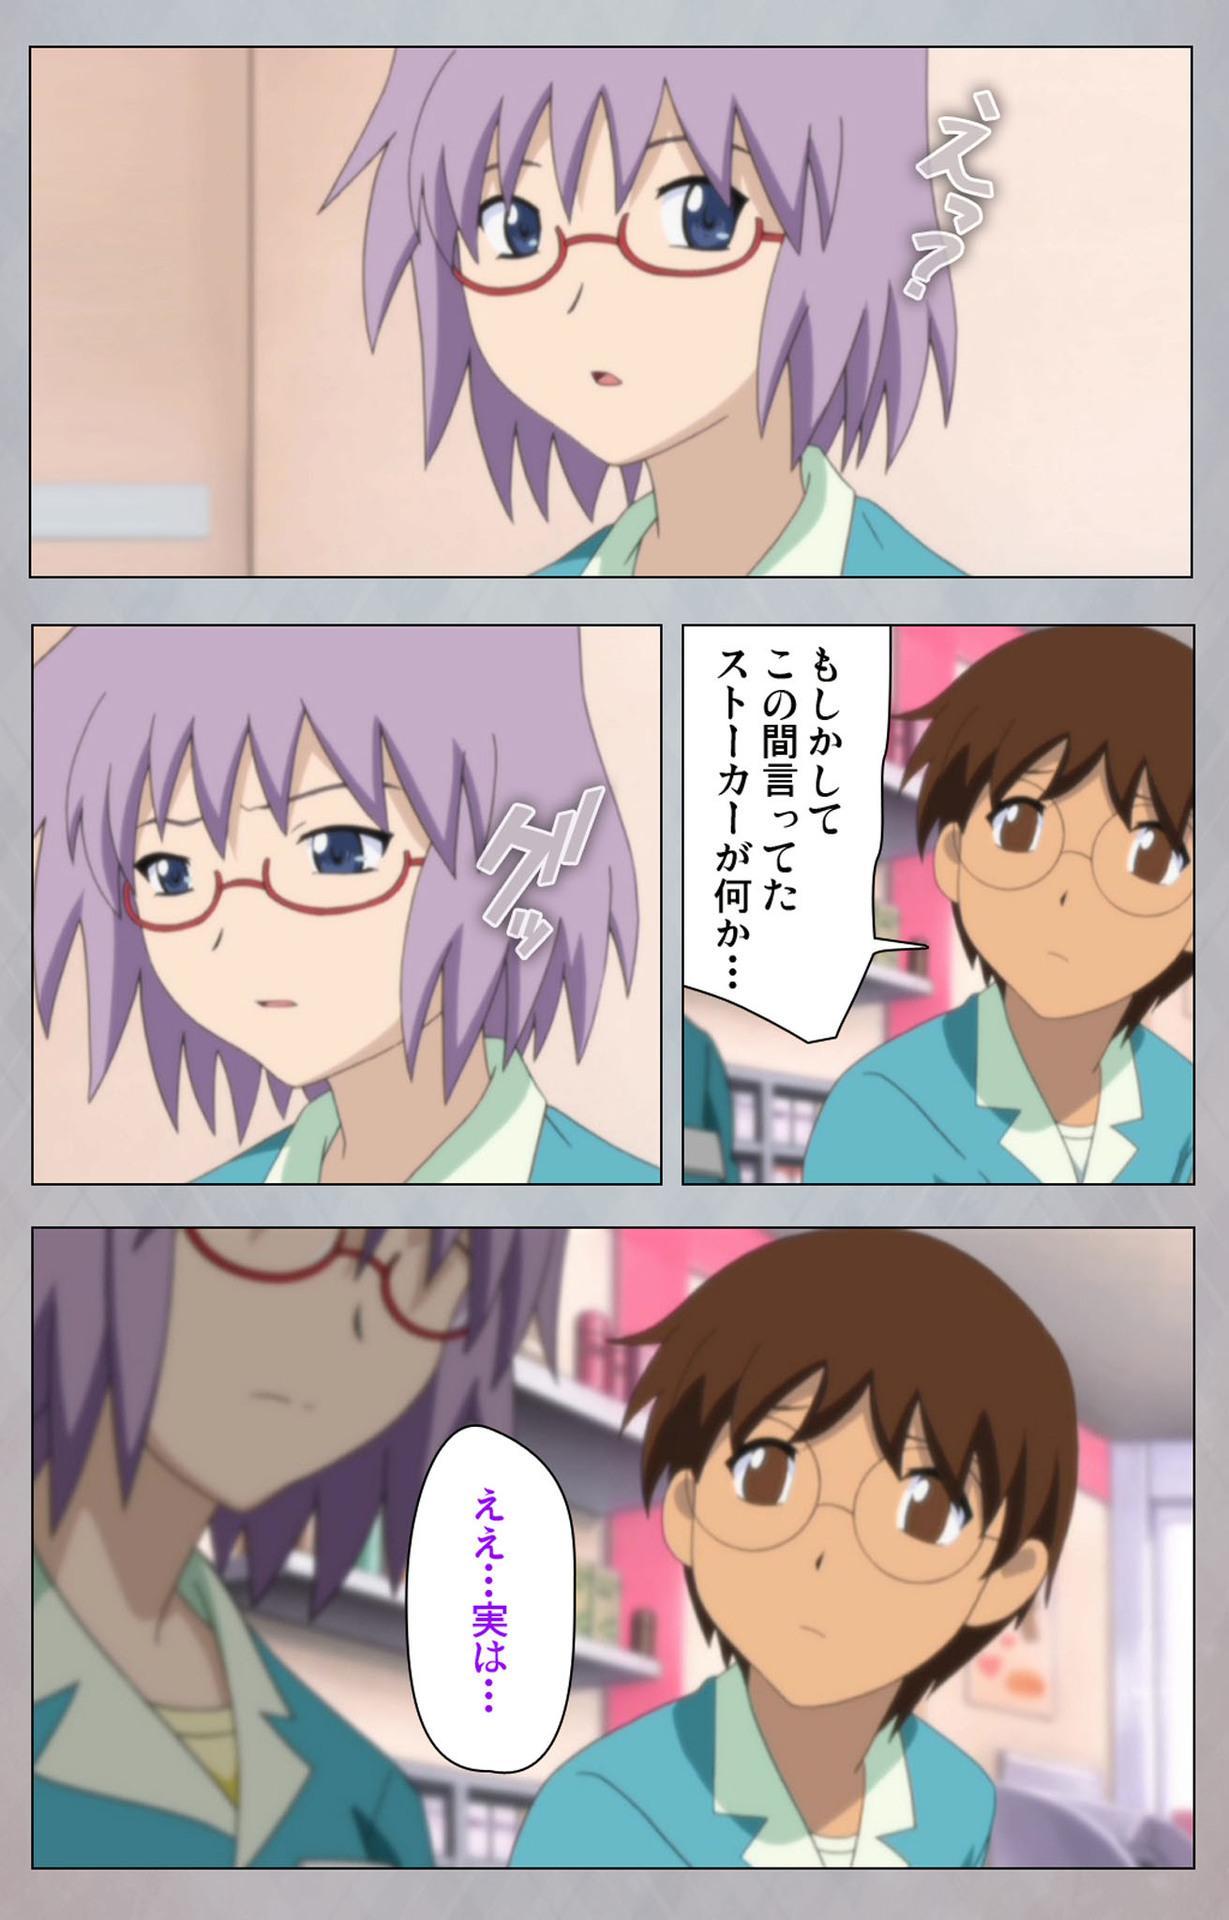 [Digital Works] [Full Color Seijin Ban] Sex Android ~Risou no Onna de Nuite yaru~ Kanzenban 101